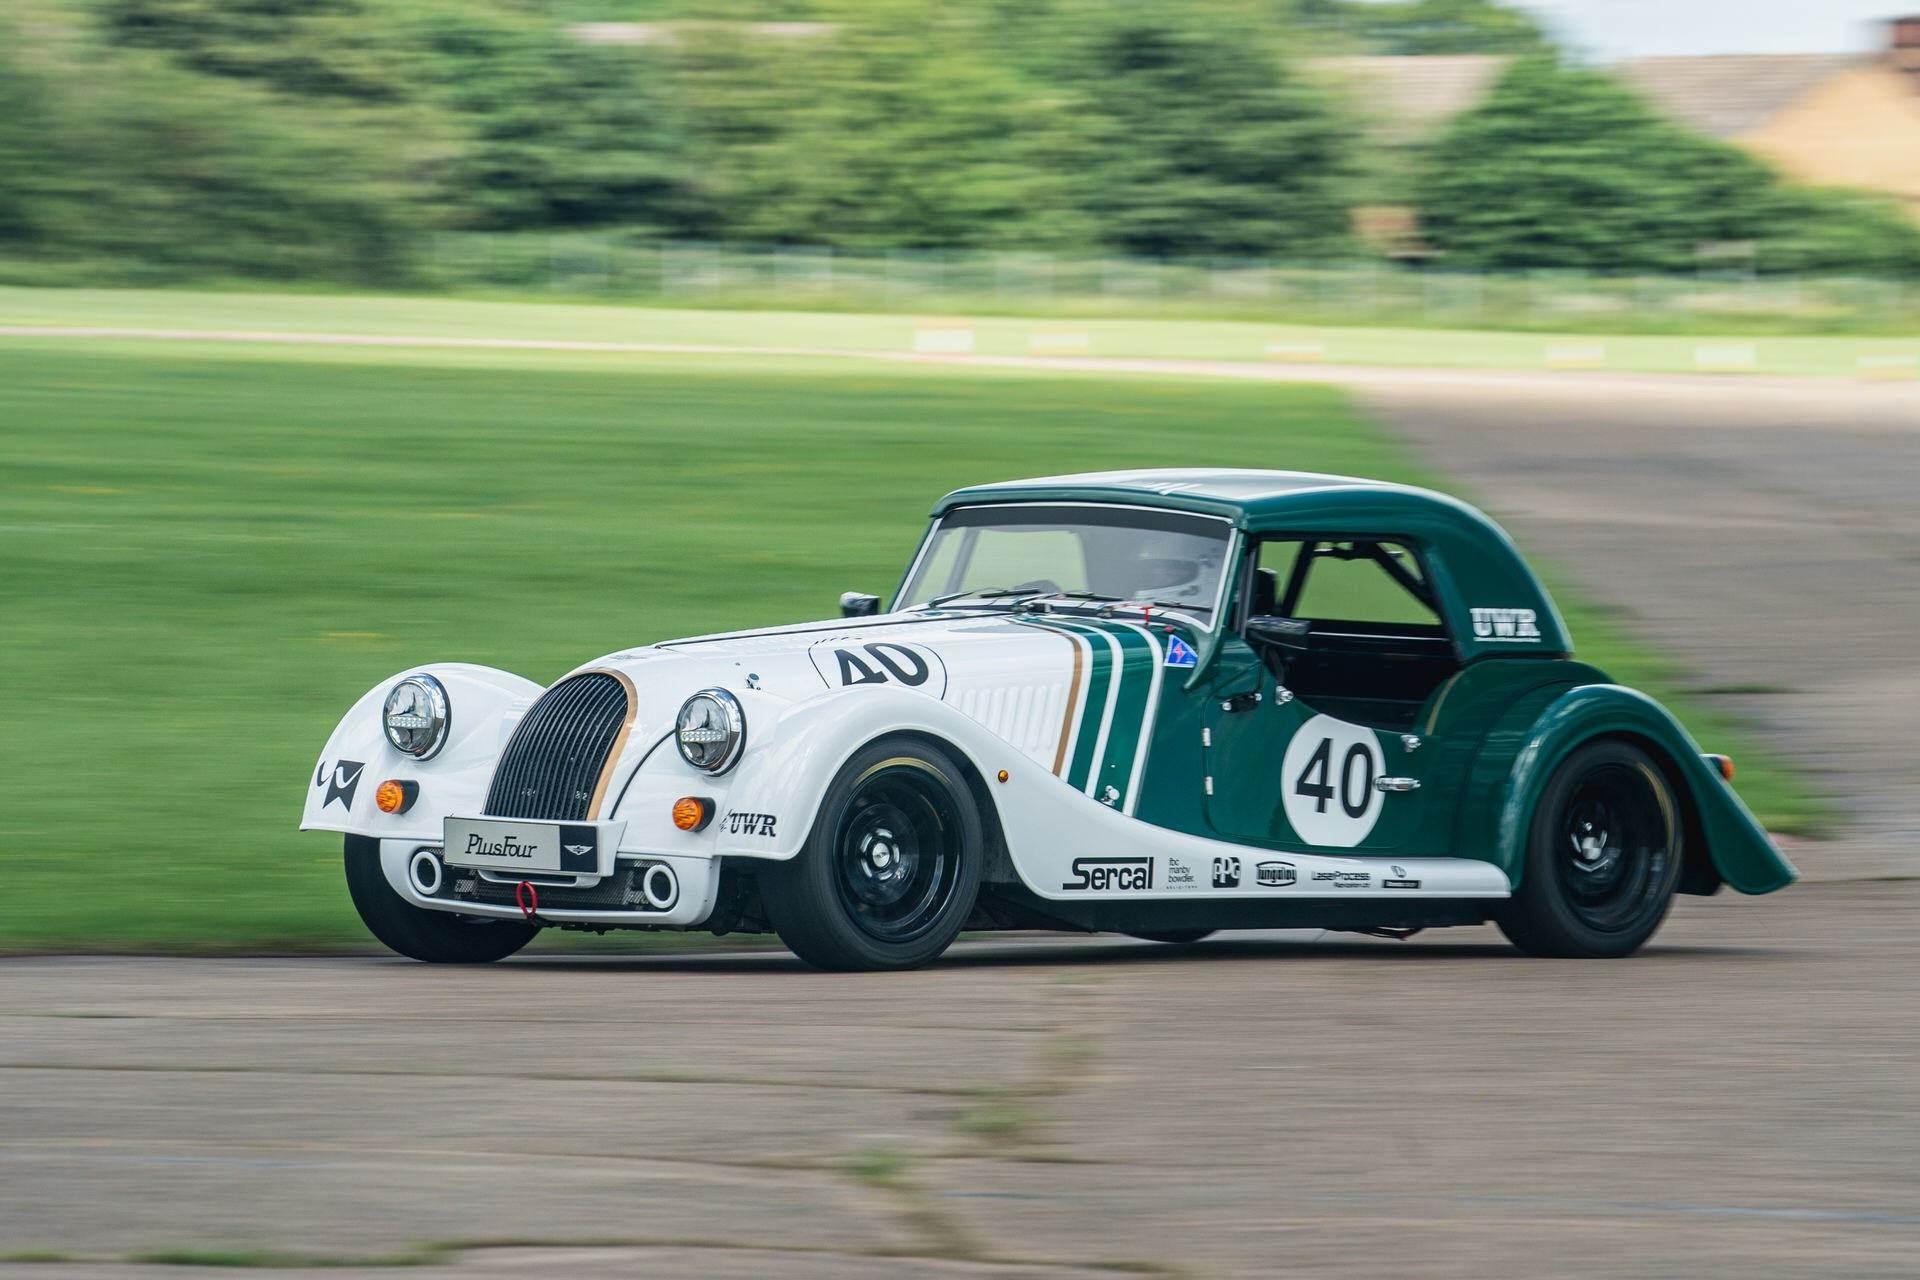 Morgan_Plus_Four_race_cars-0012